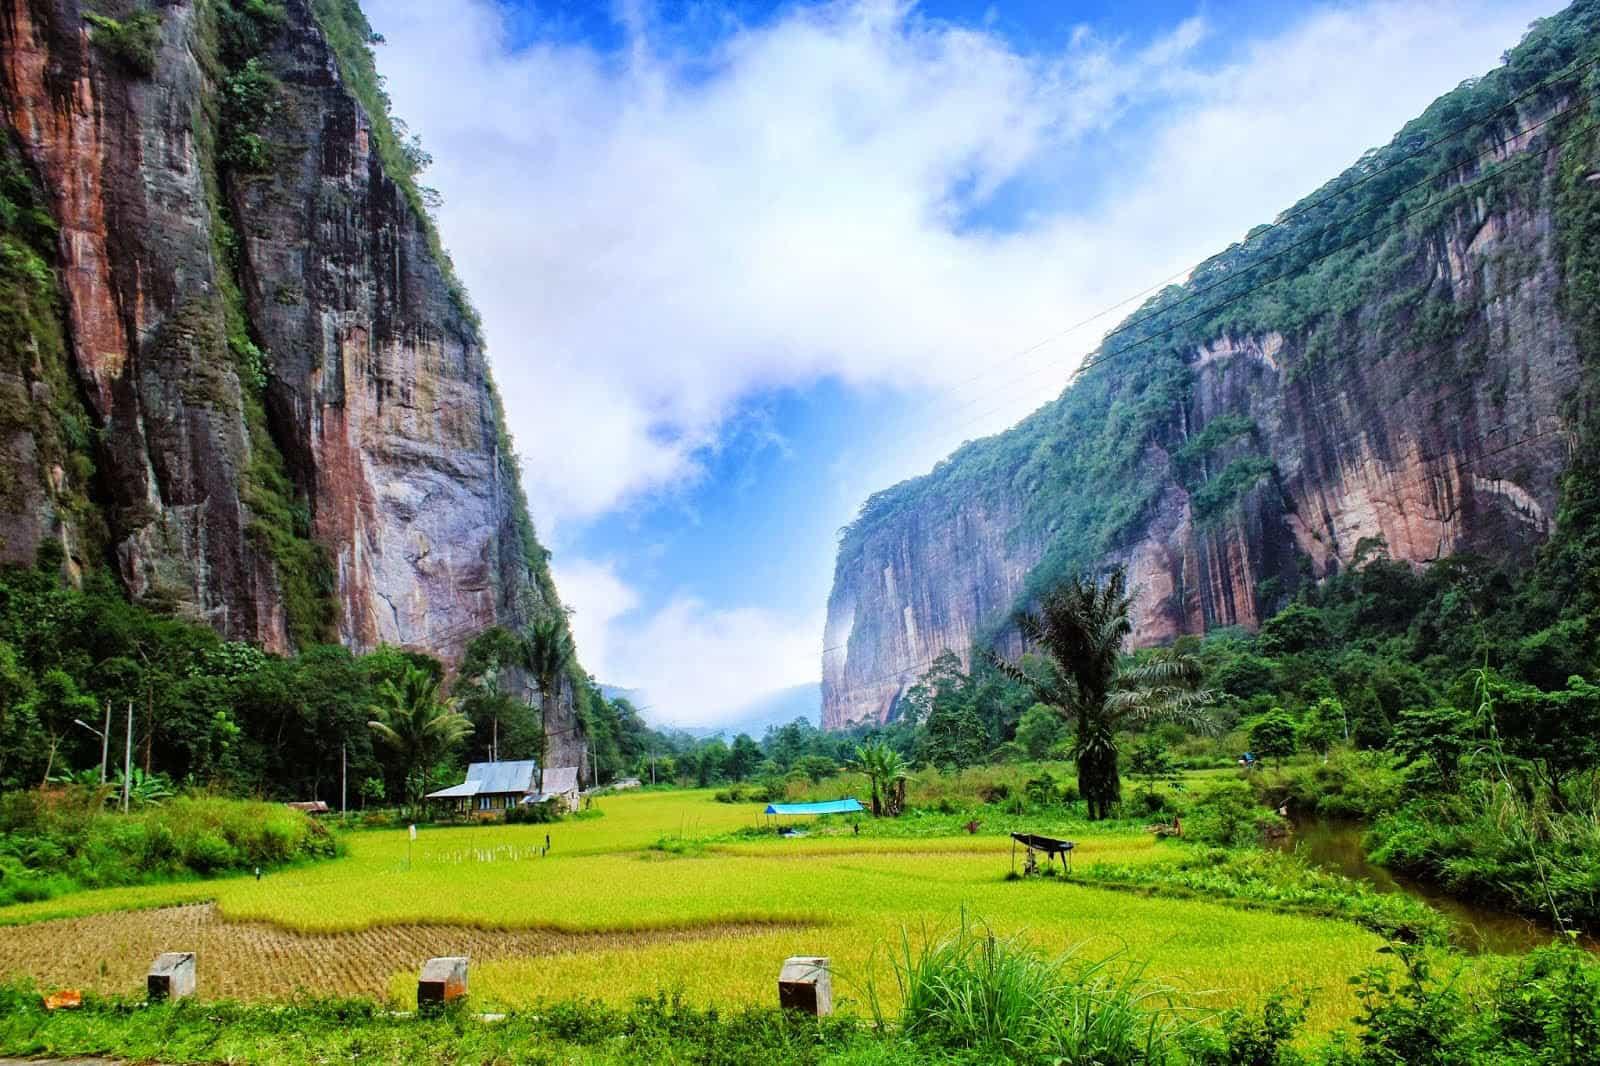 Sumatra lembah haru panorama